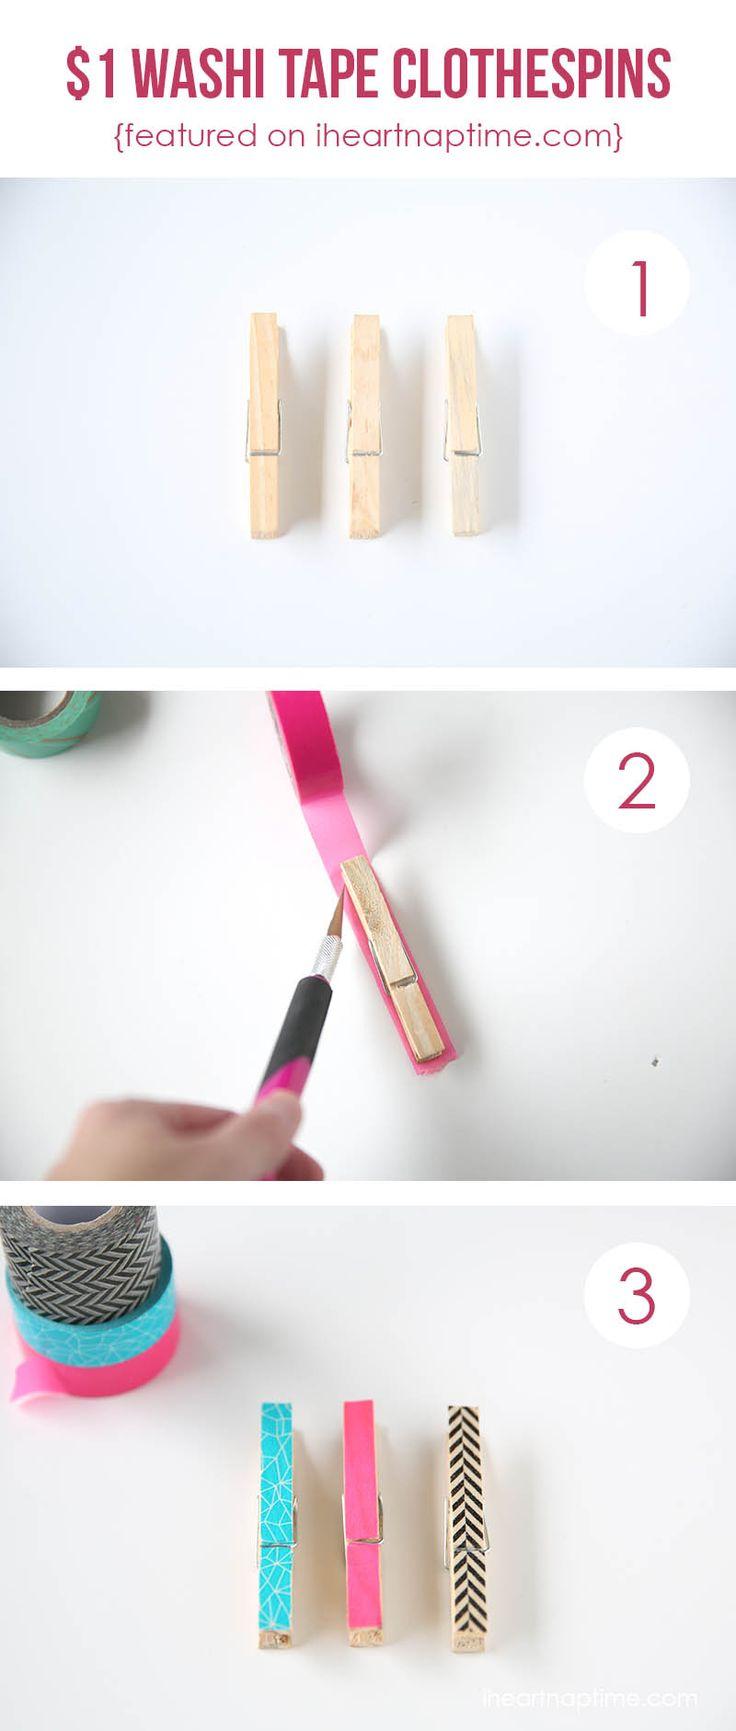 Washi Tape Clothespins